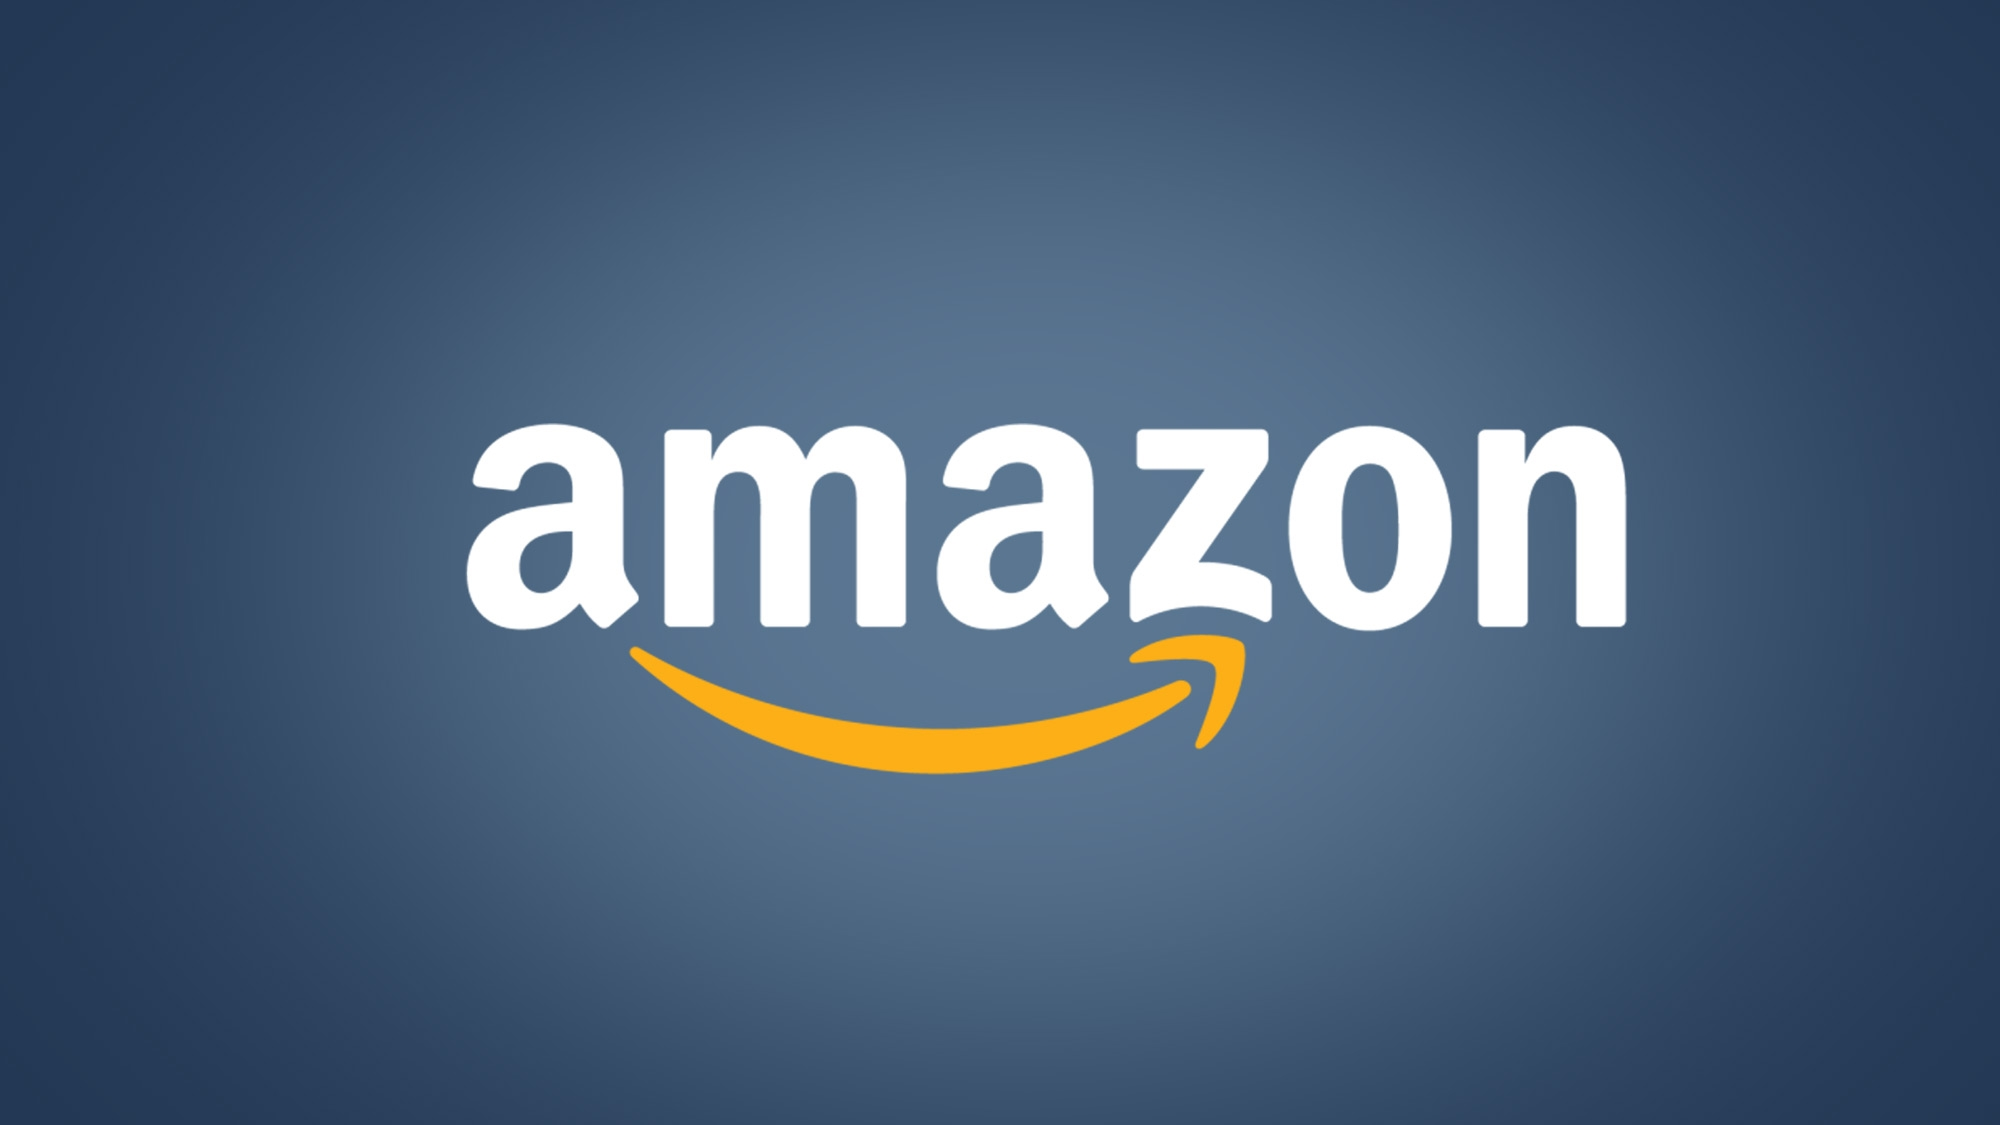 amazon logo empresa